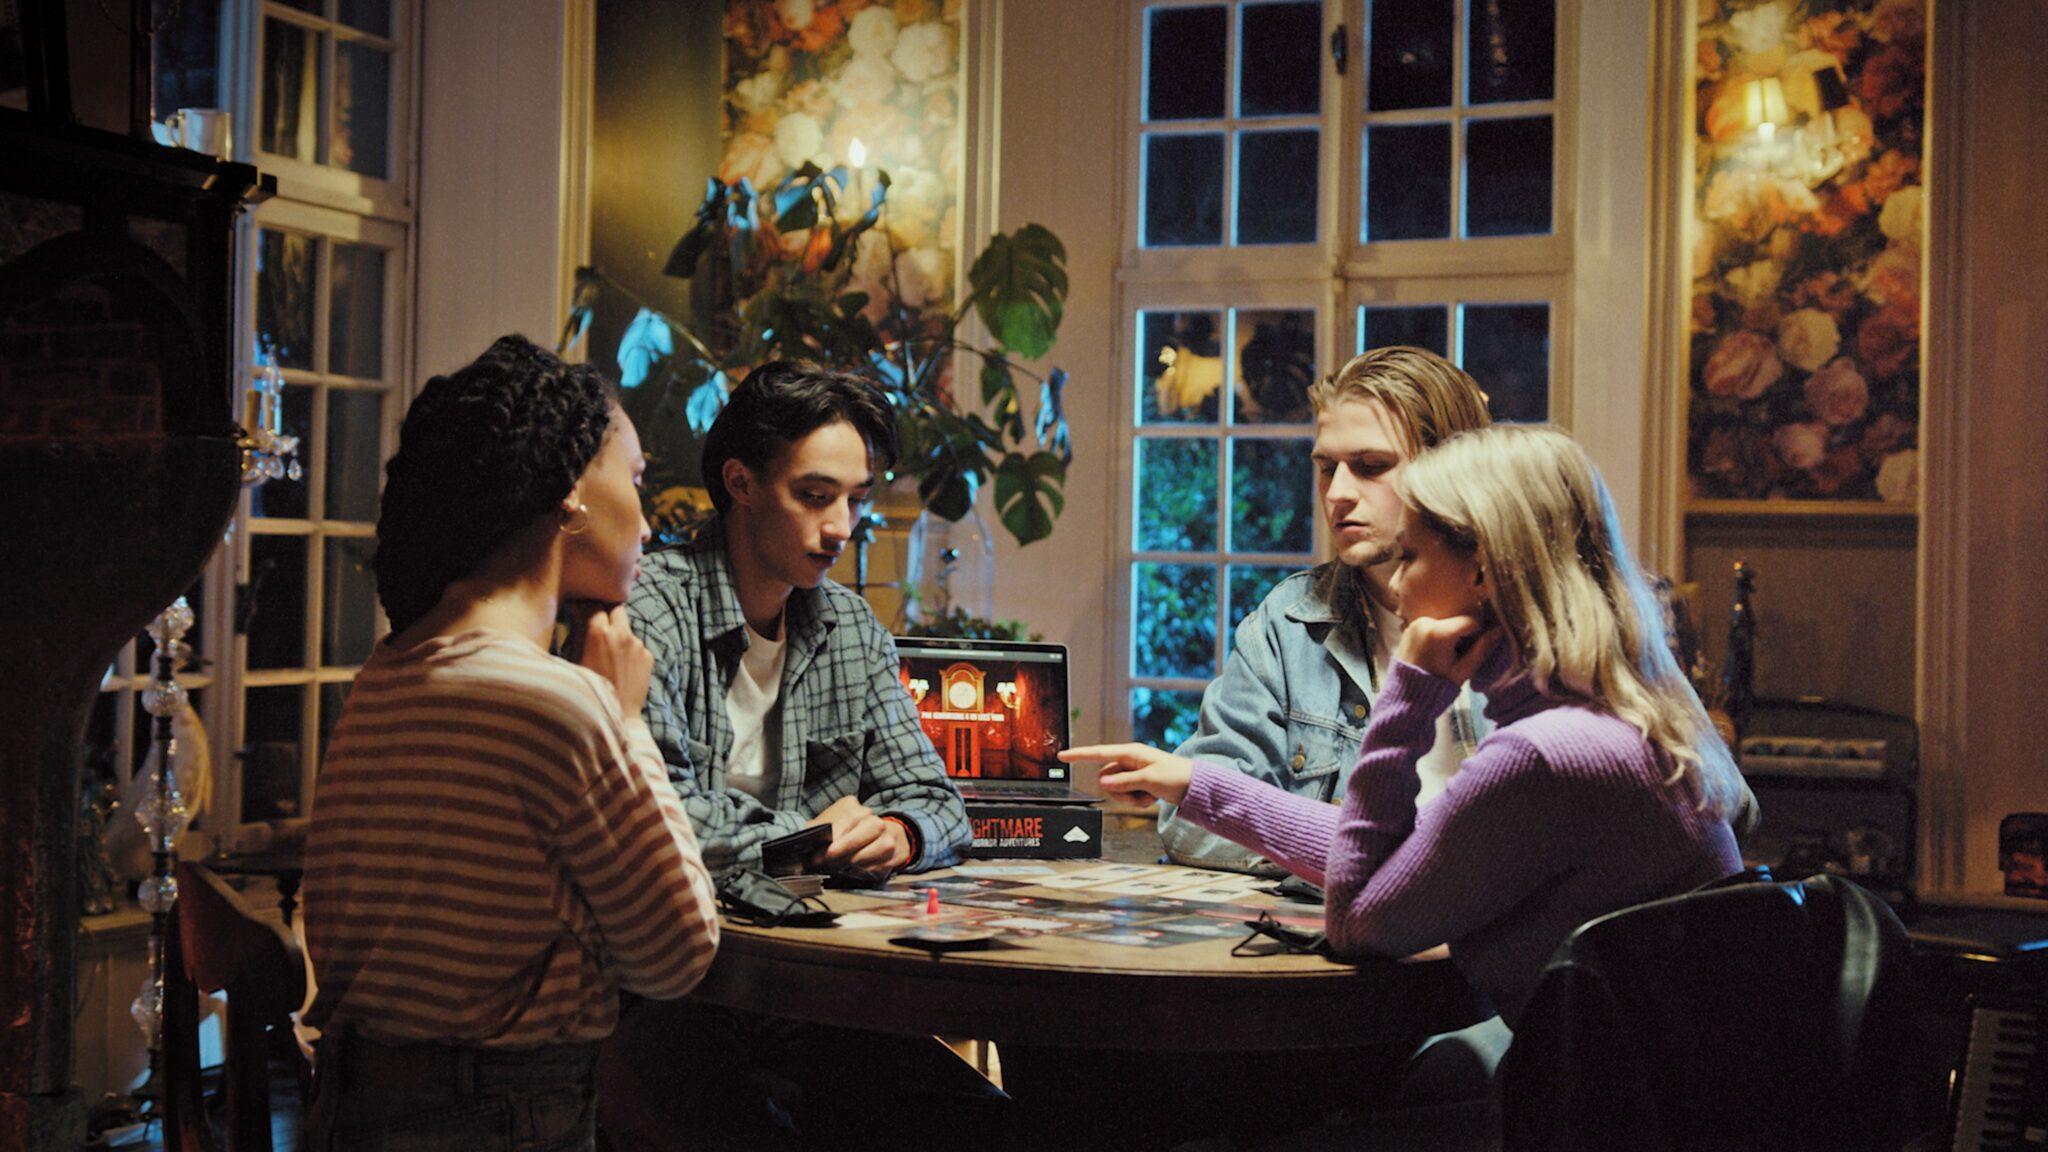 Leukste bordspellen 2020 leuke spelletjes Identity Games